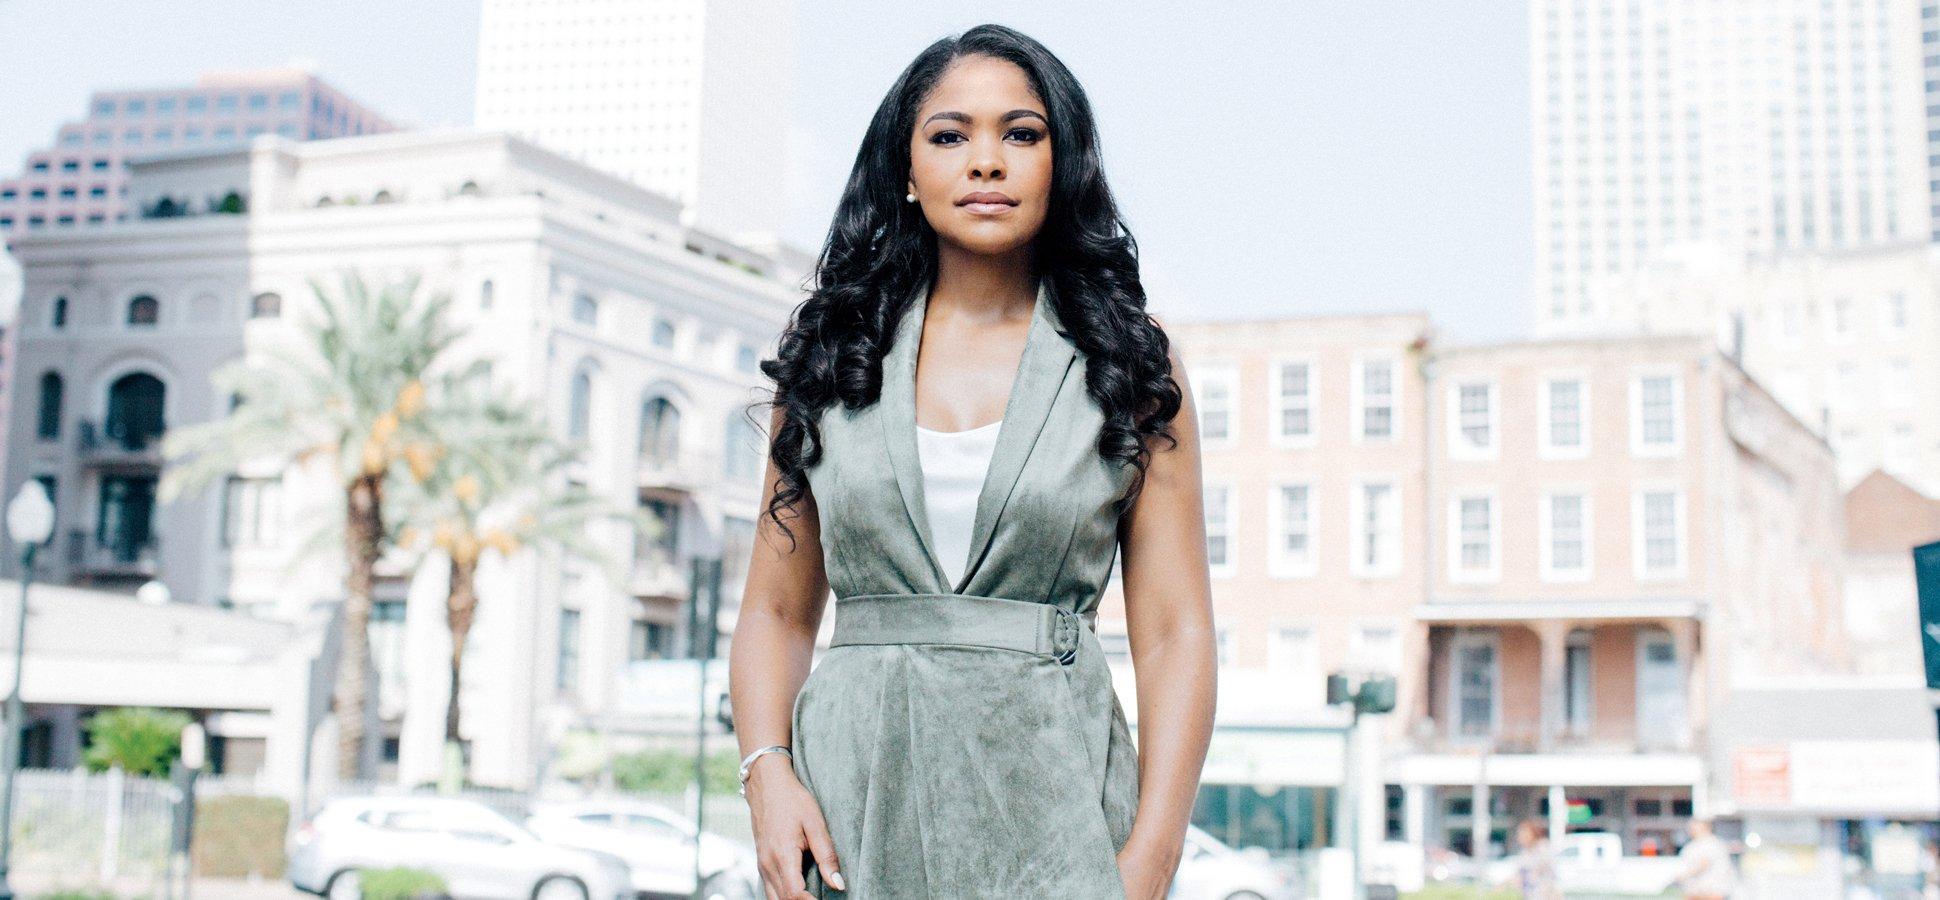 Meet the Women Building America's Most Inspiring Businesses